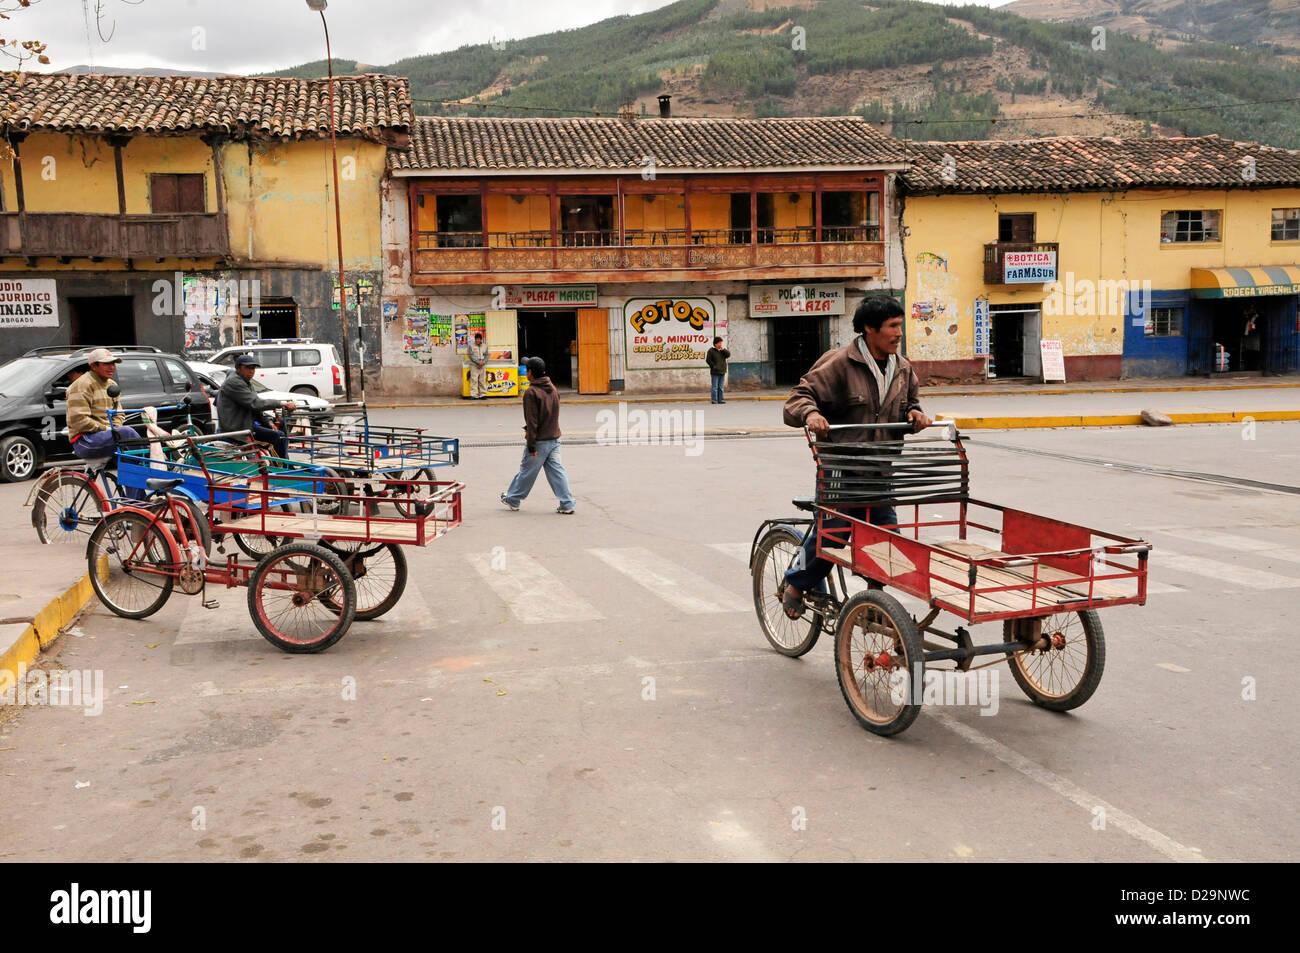 Tricycle Carts, Peru - Stock Image